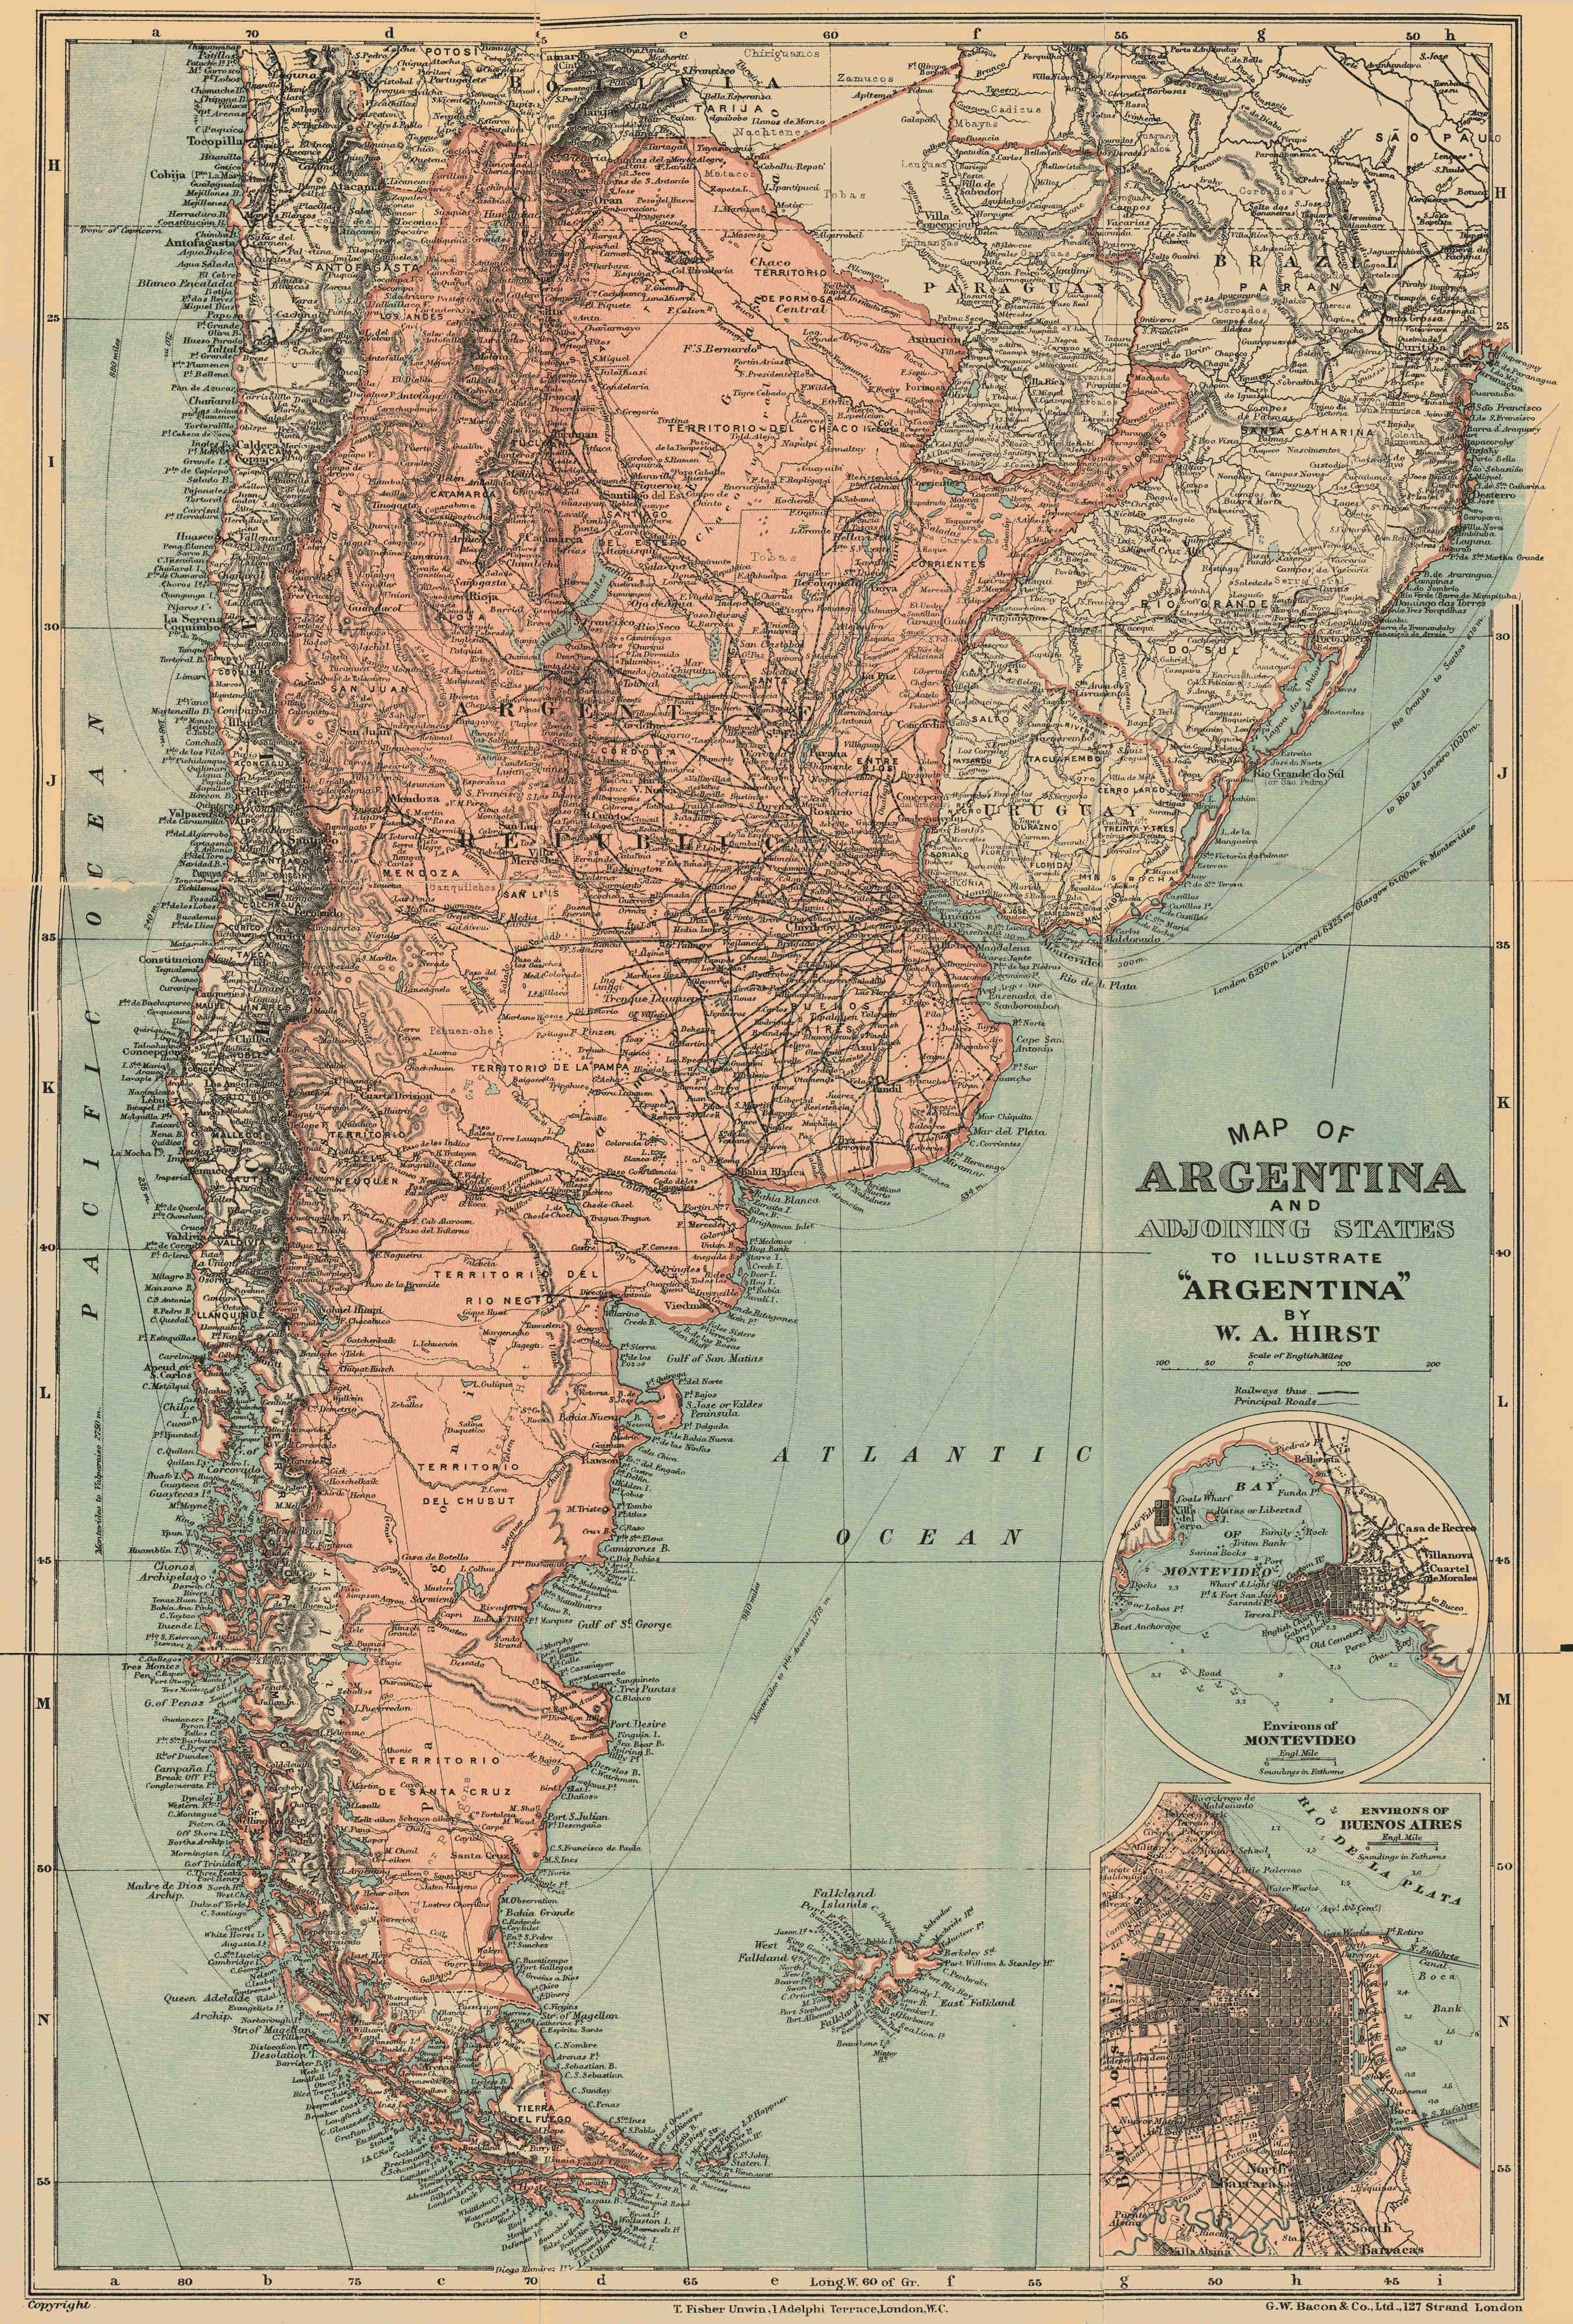 FileMAP OF ARGENTINA AND ADJOINING STATESUKsPGjpg - Vintage maps uk